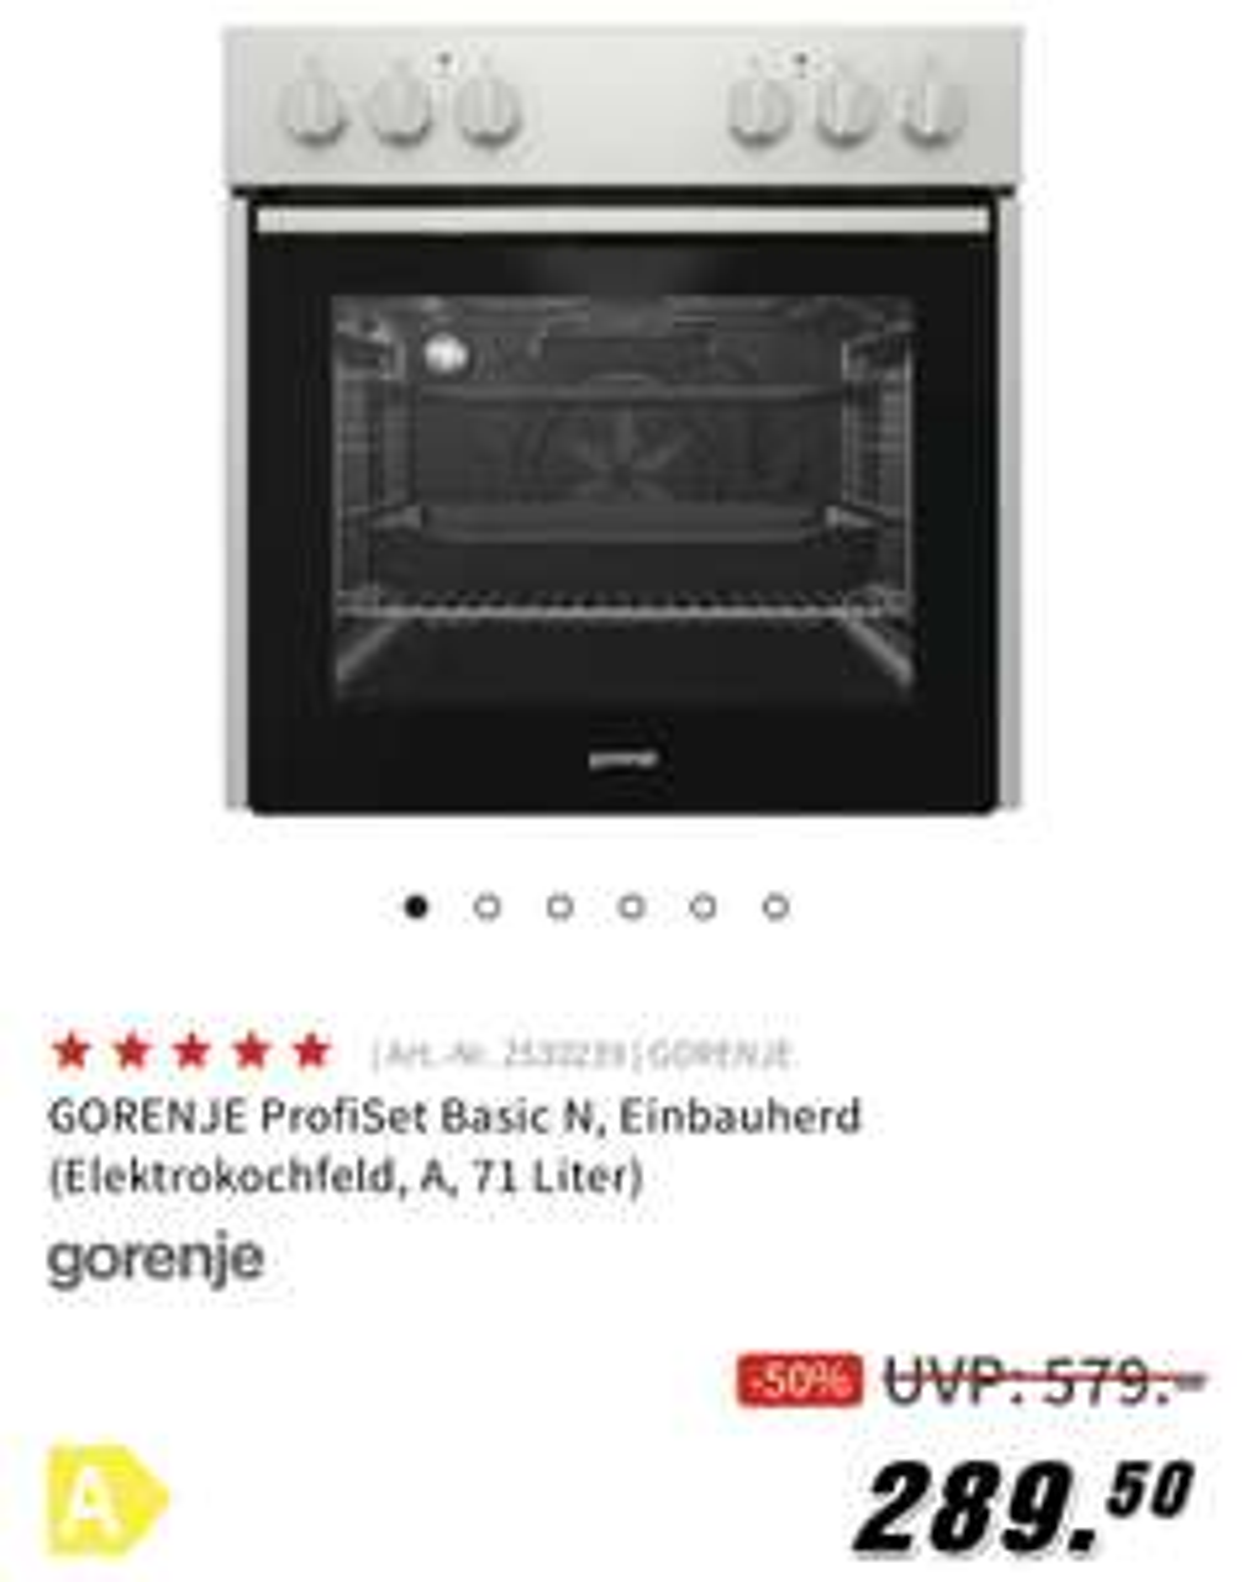 GORENJE ProfiSet Basic N, Einbauherd (Elektrokochfeld, A, 71 Liter)